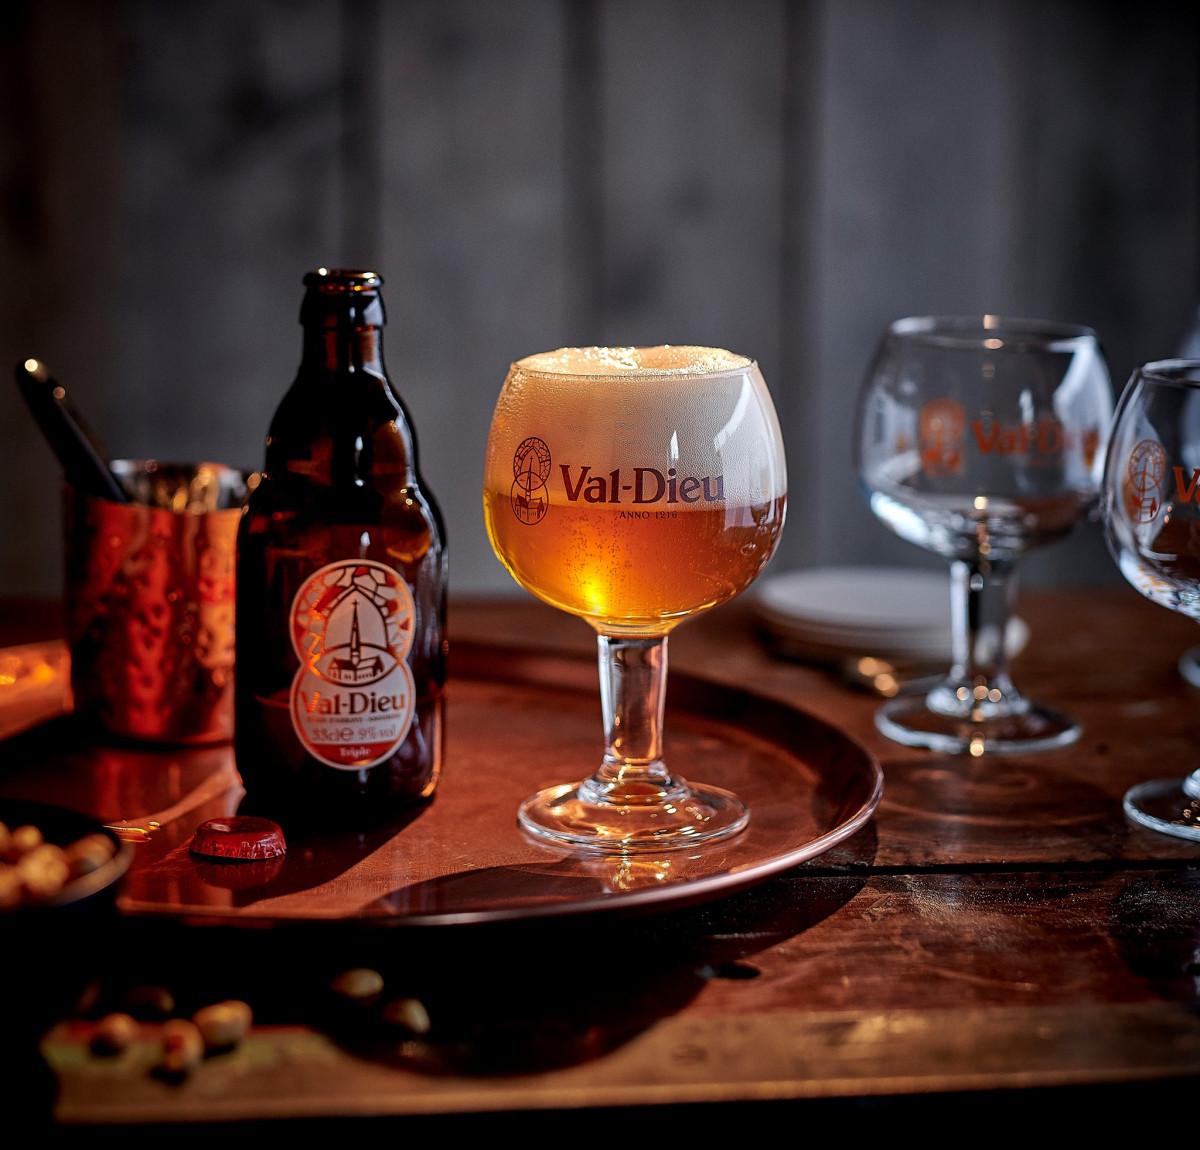 Bières val dieu